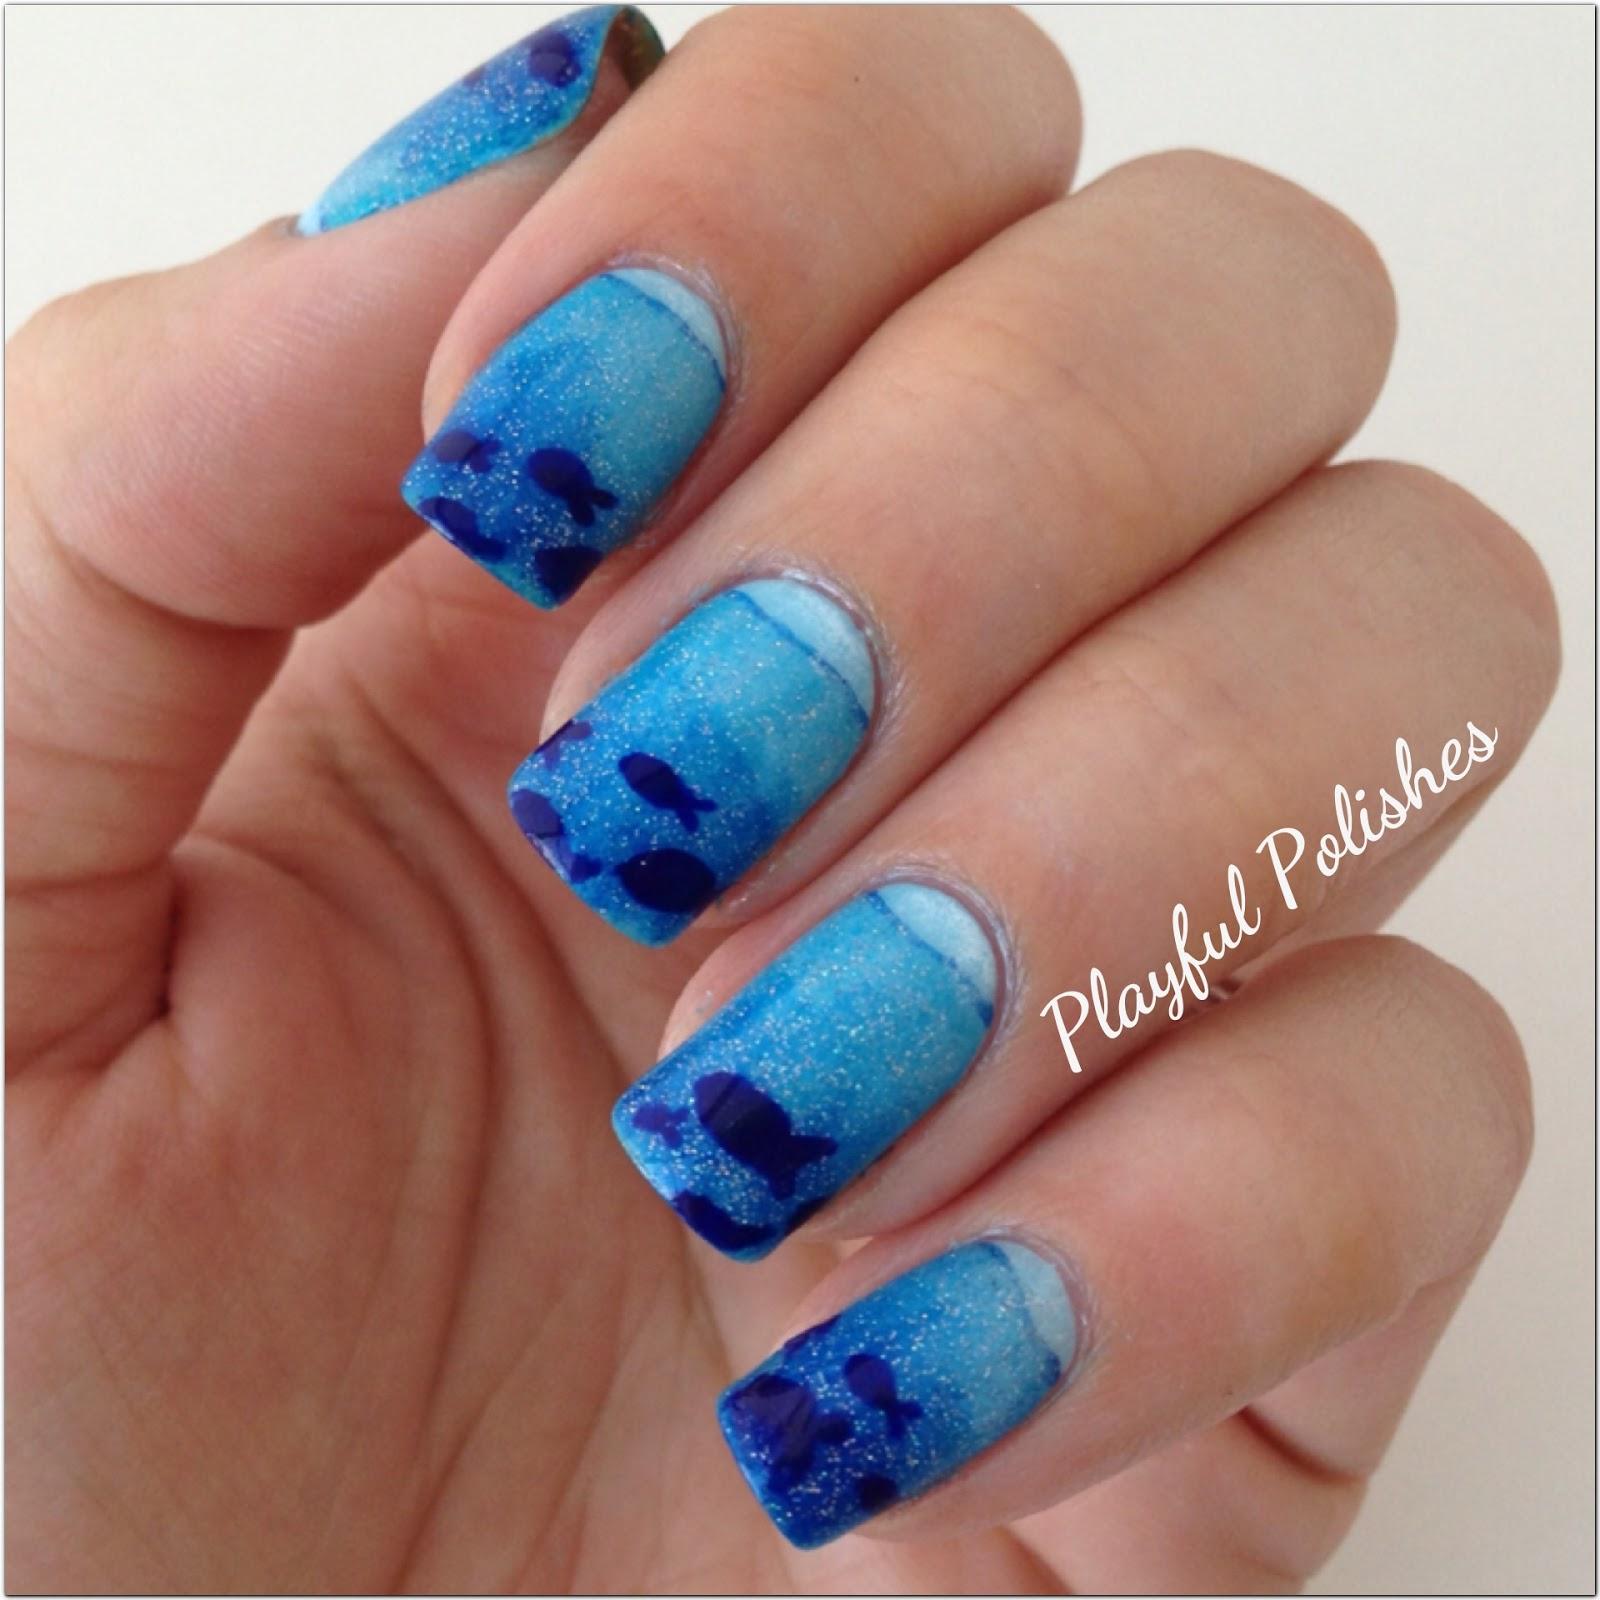 Playful Polishes: JUNE NAIL ART CHALLENGE: OCEAN NAILS